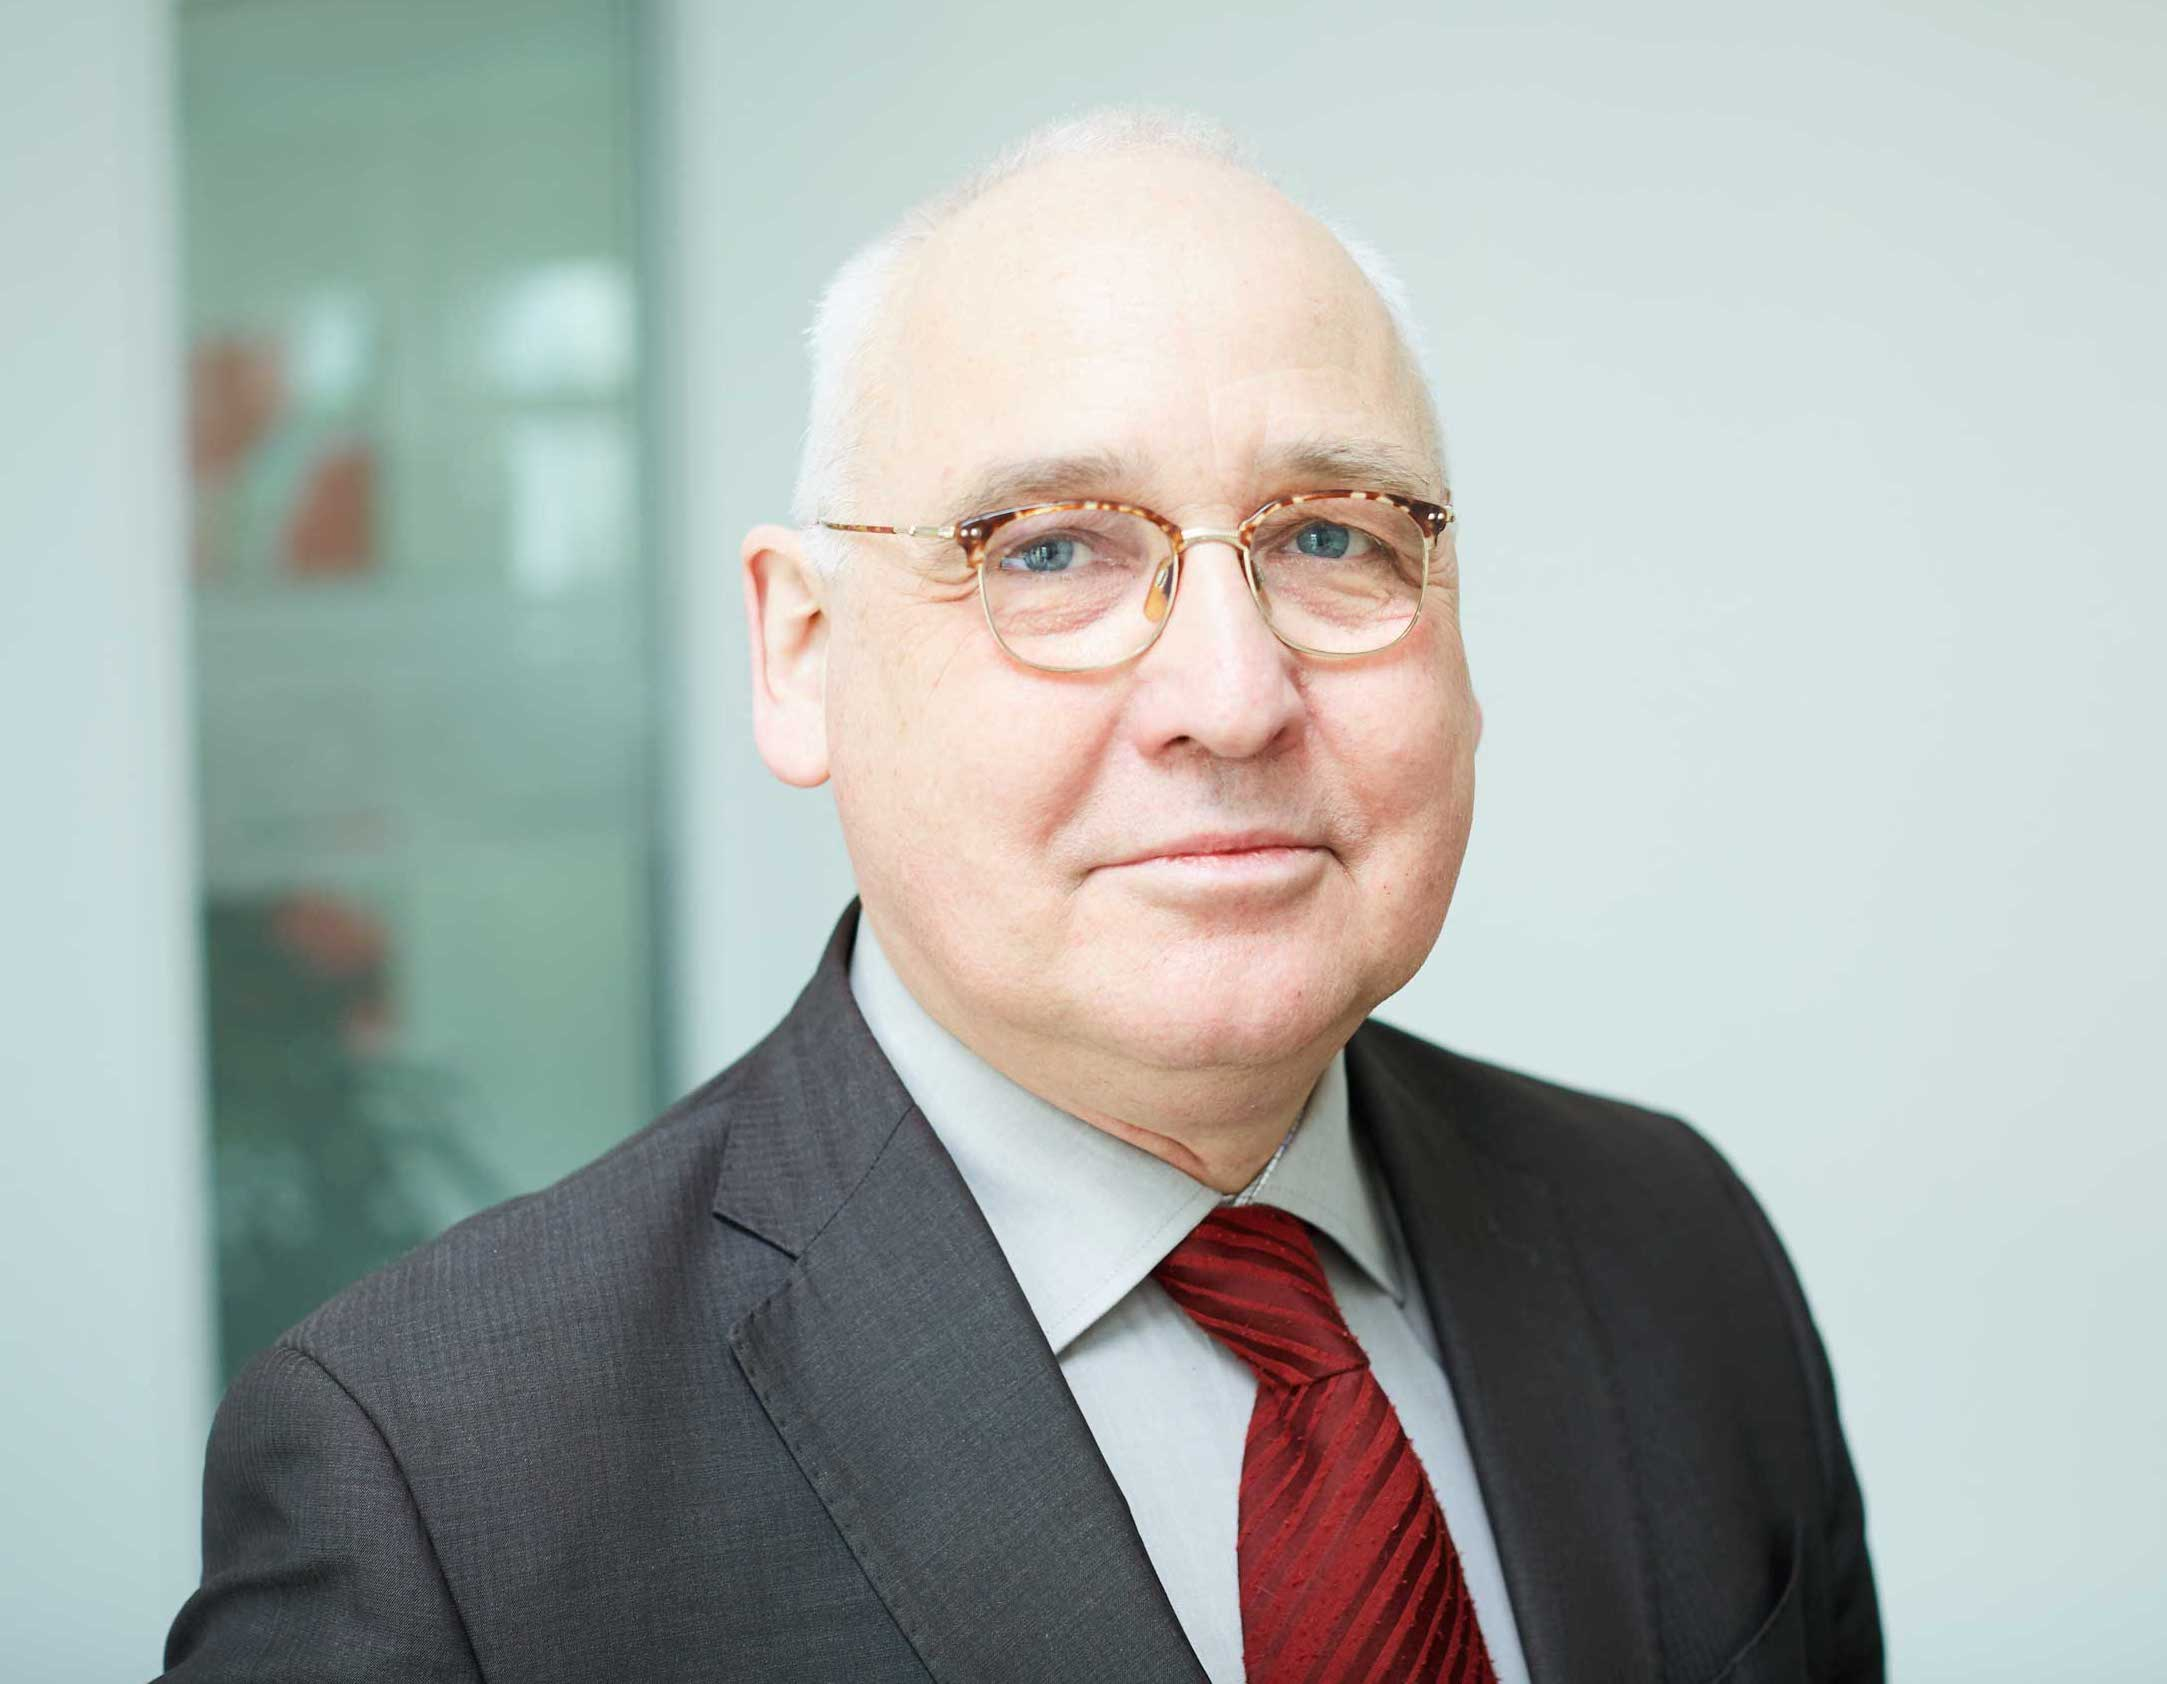 Dr. Michael Tiedtke